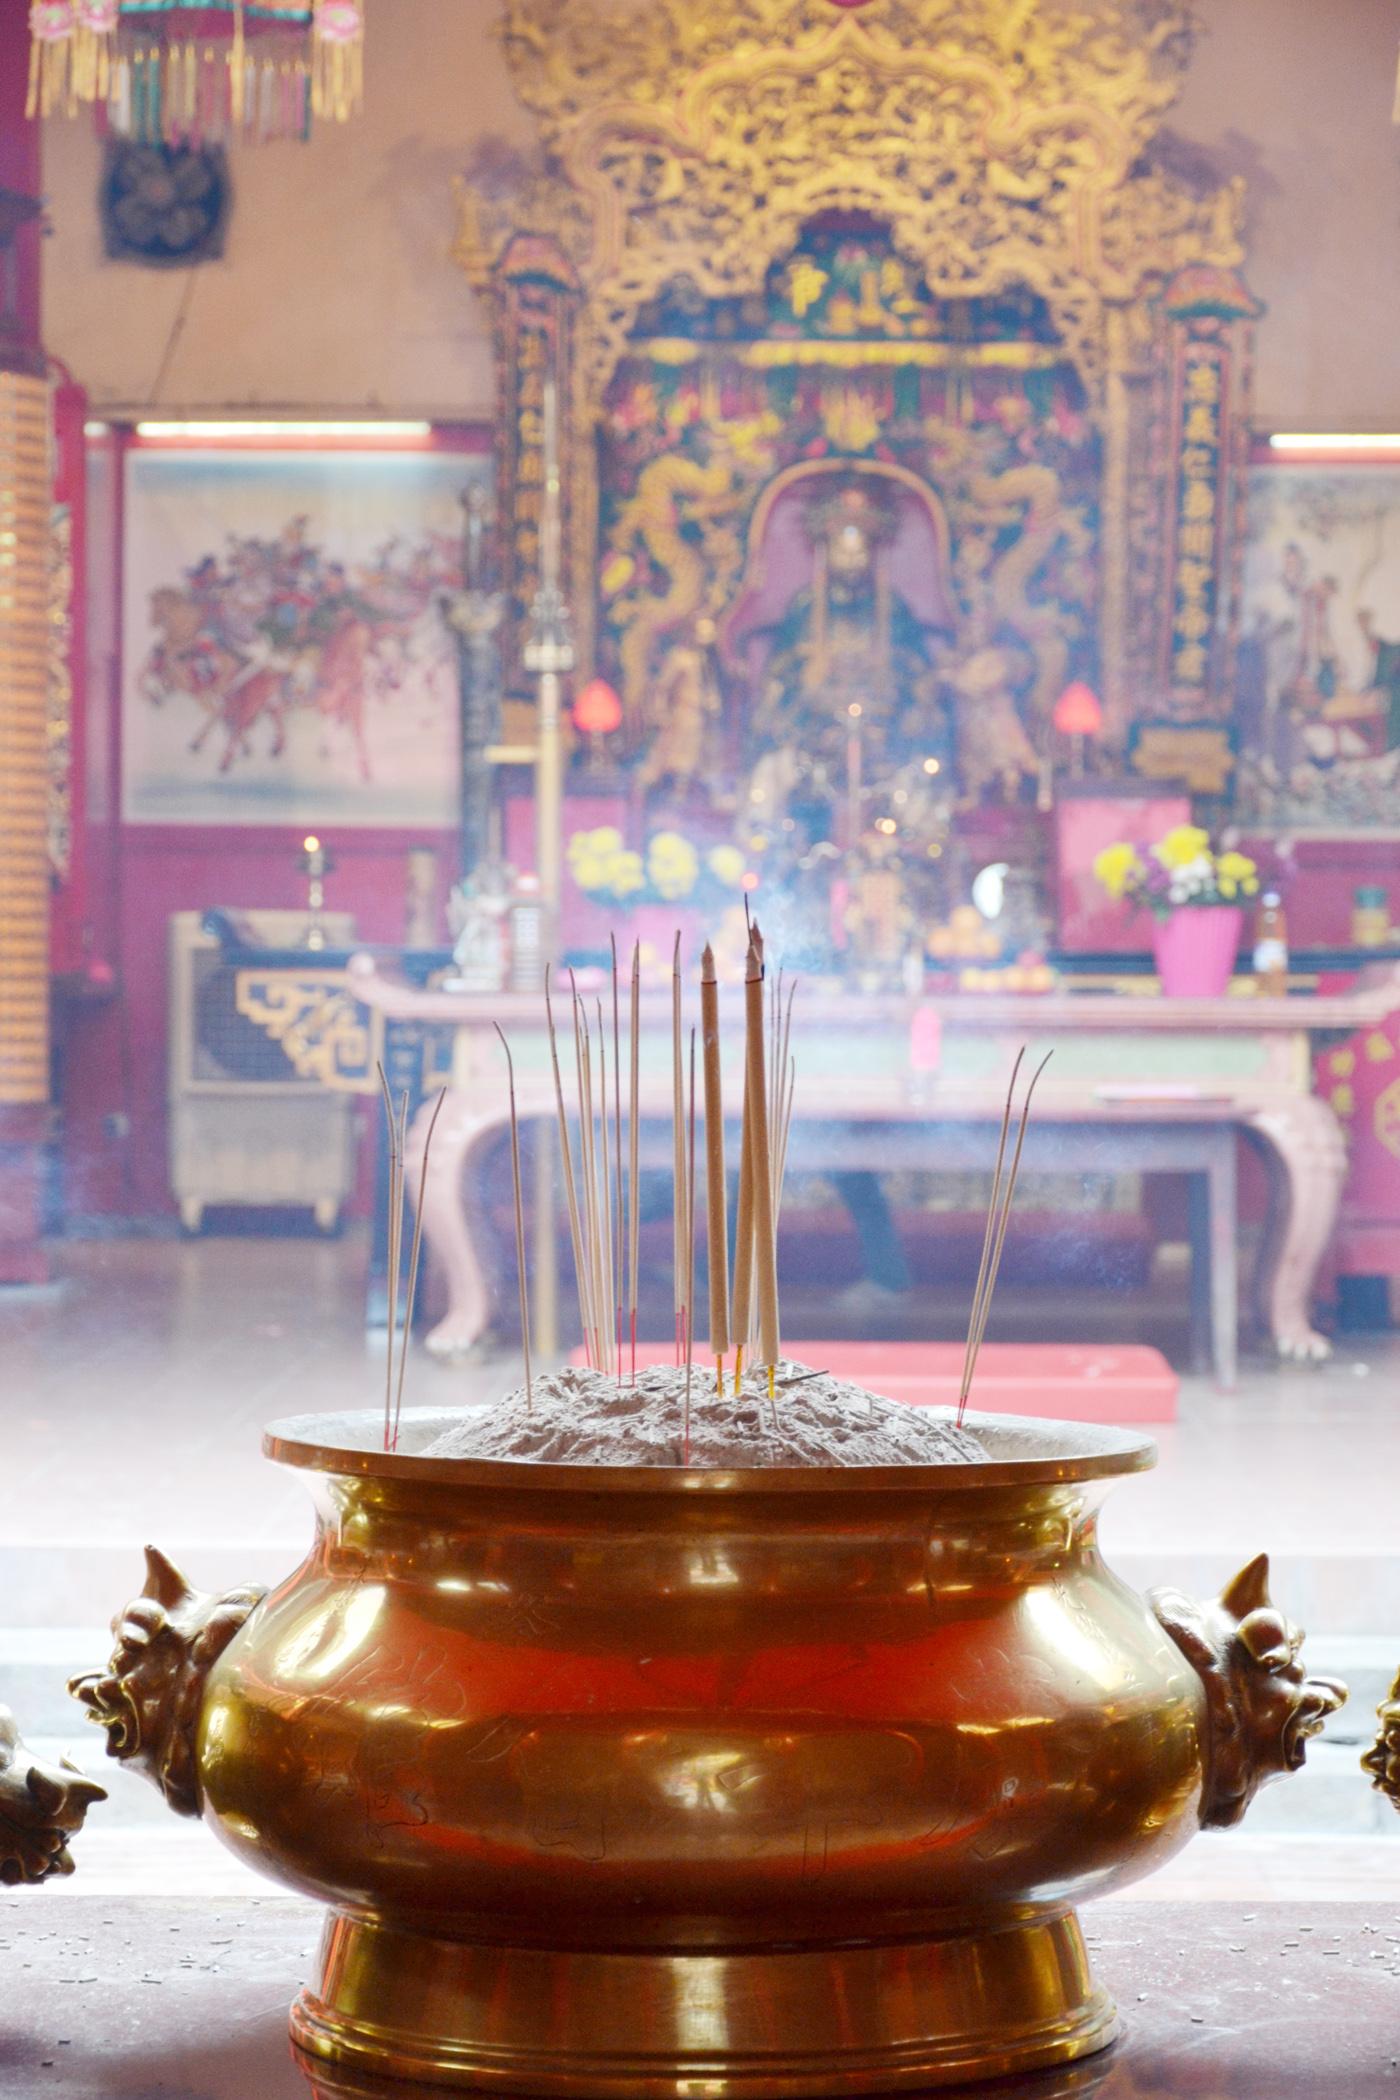 What-to-do-in-Kuala-Lumpur-chinatown-gucki-temple